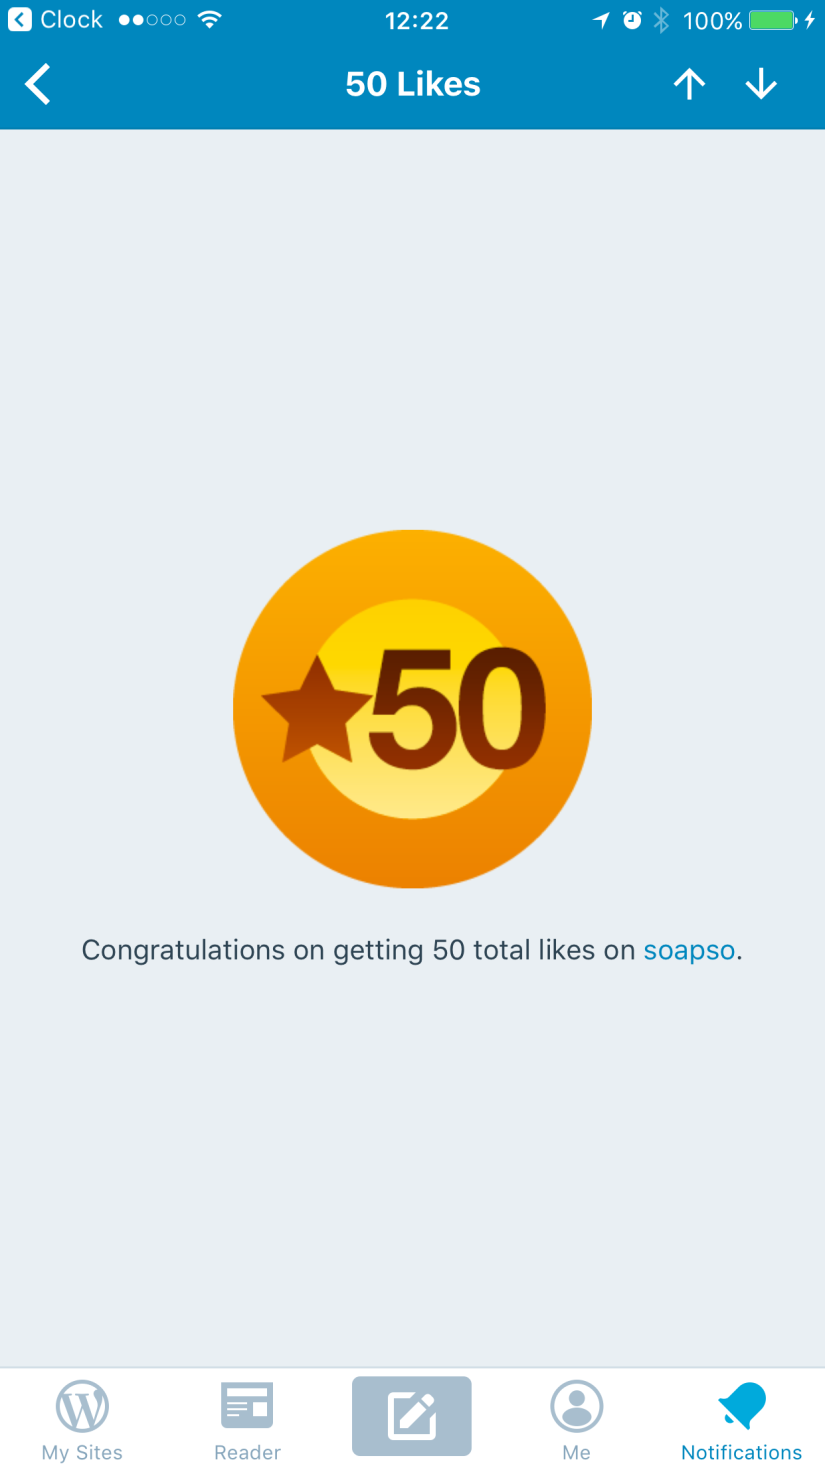 50 likes?!?